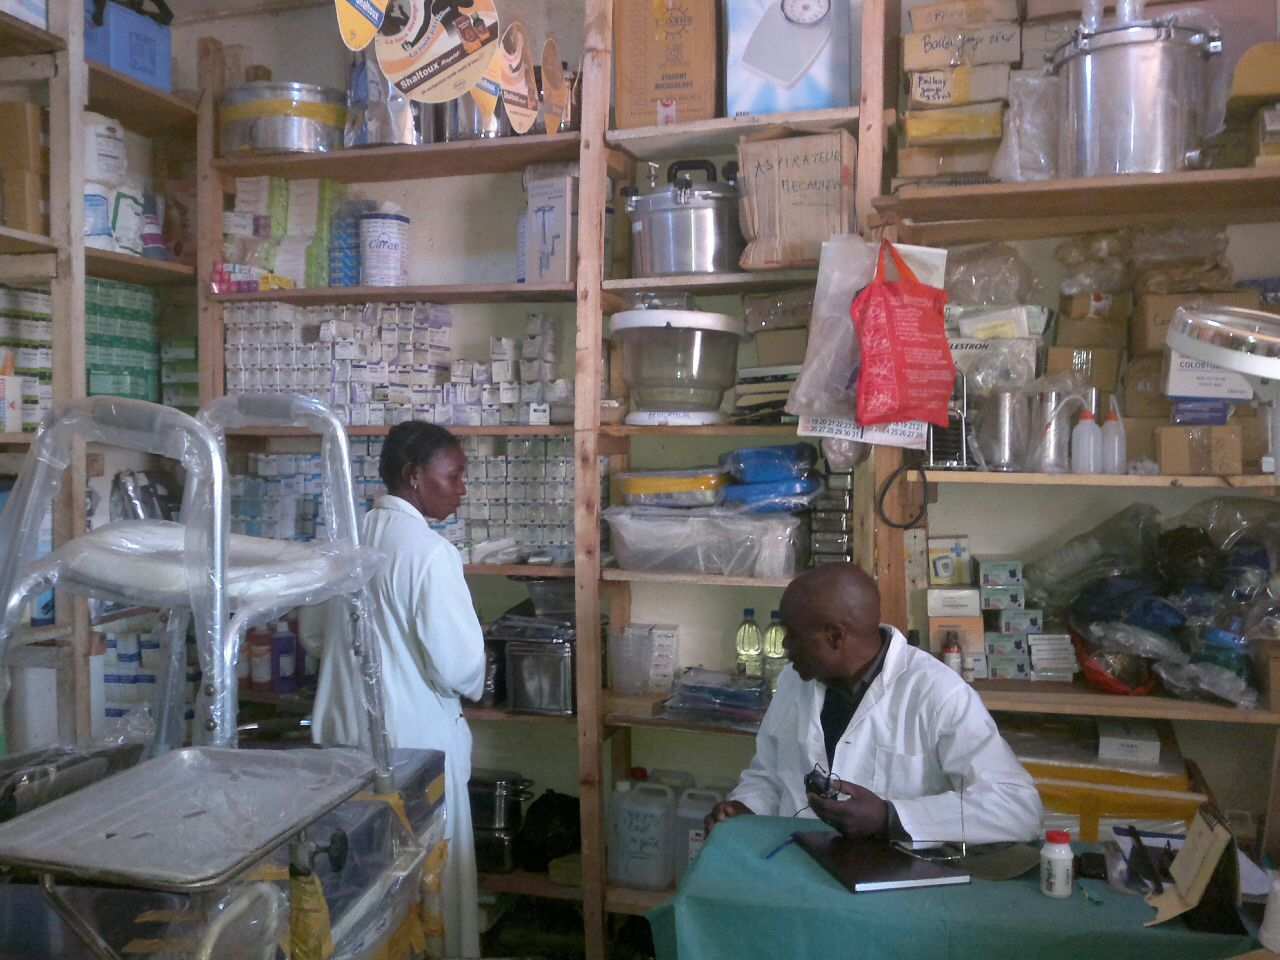 Pharmacie du lac, preparando entrevista con MR Messo